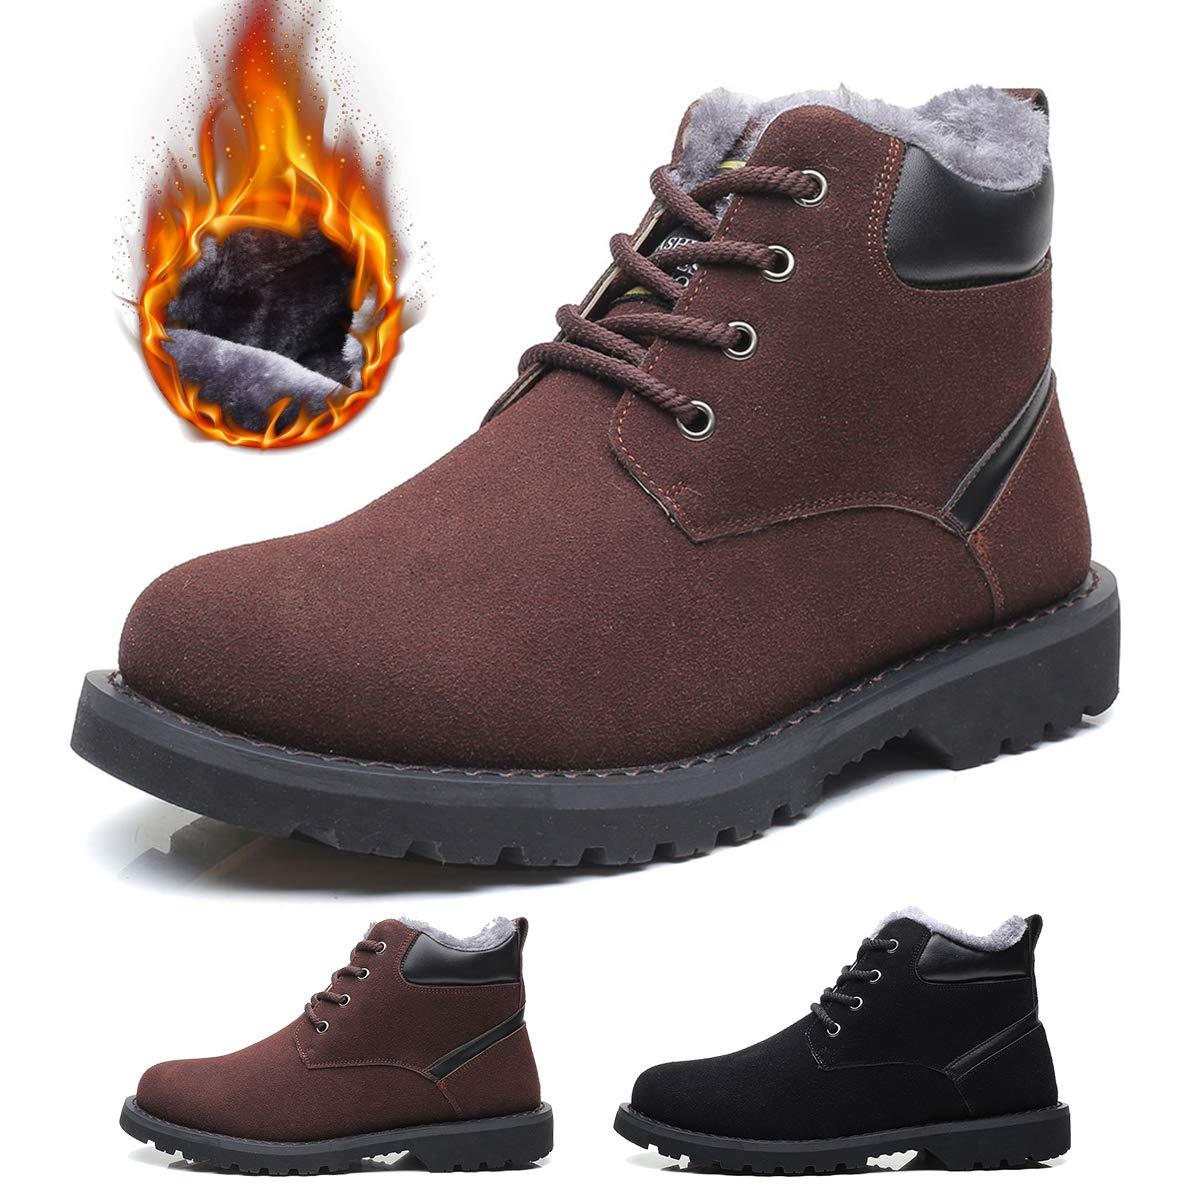 gracosy Winter Boots for Men, Men's Ankle Snow